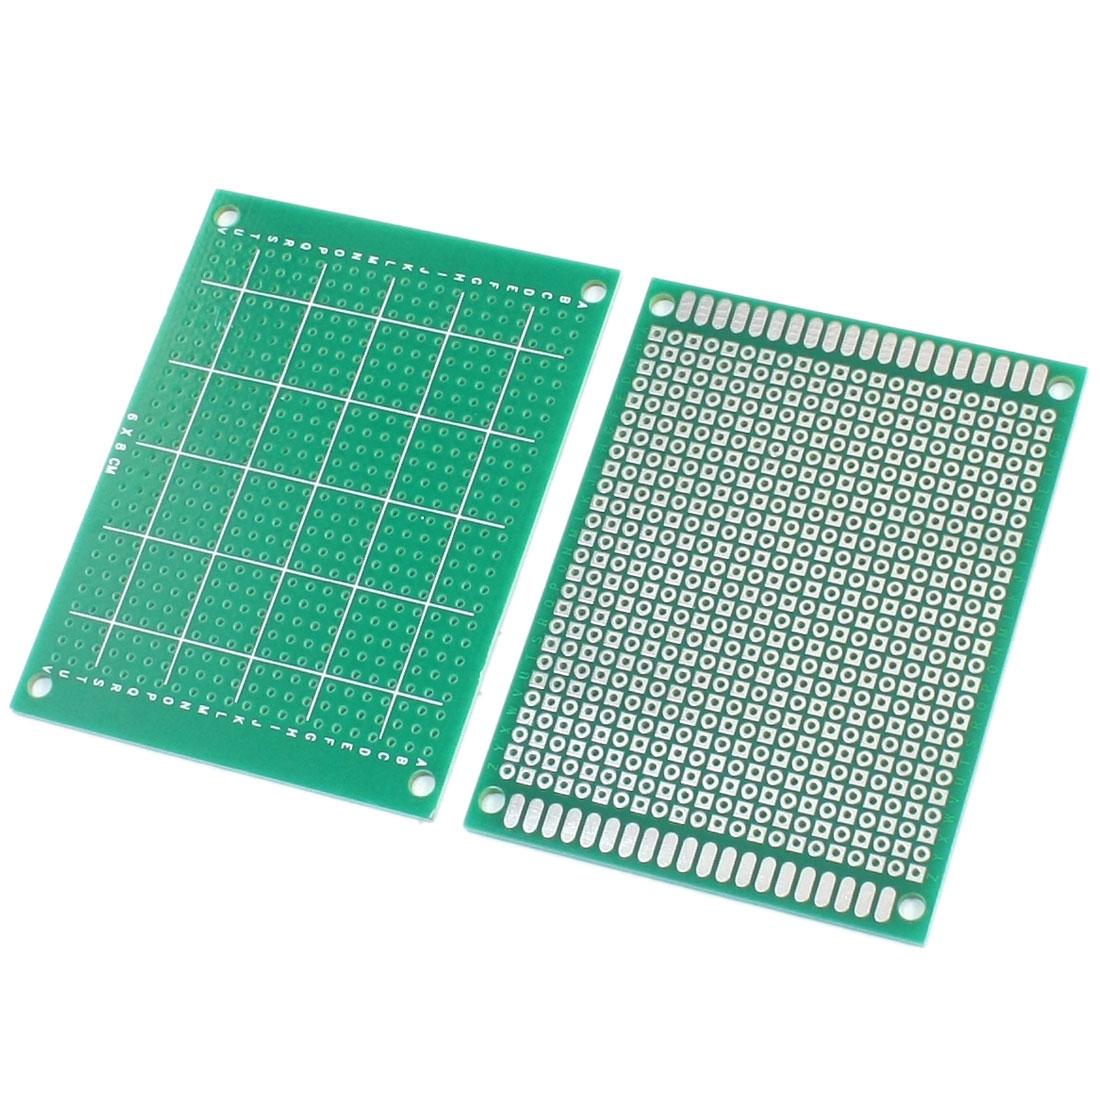 2pcs FR-4 Universal Prototype Paper PCB Printed Circuit Board 6 x 8cm